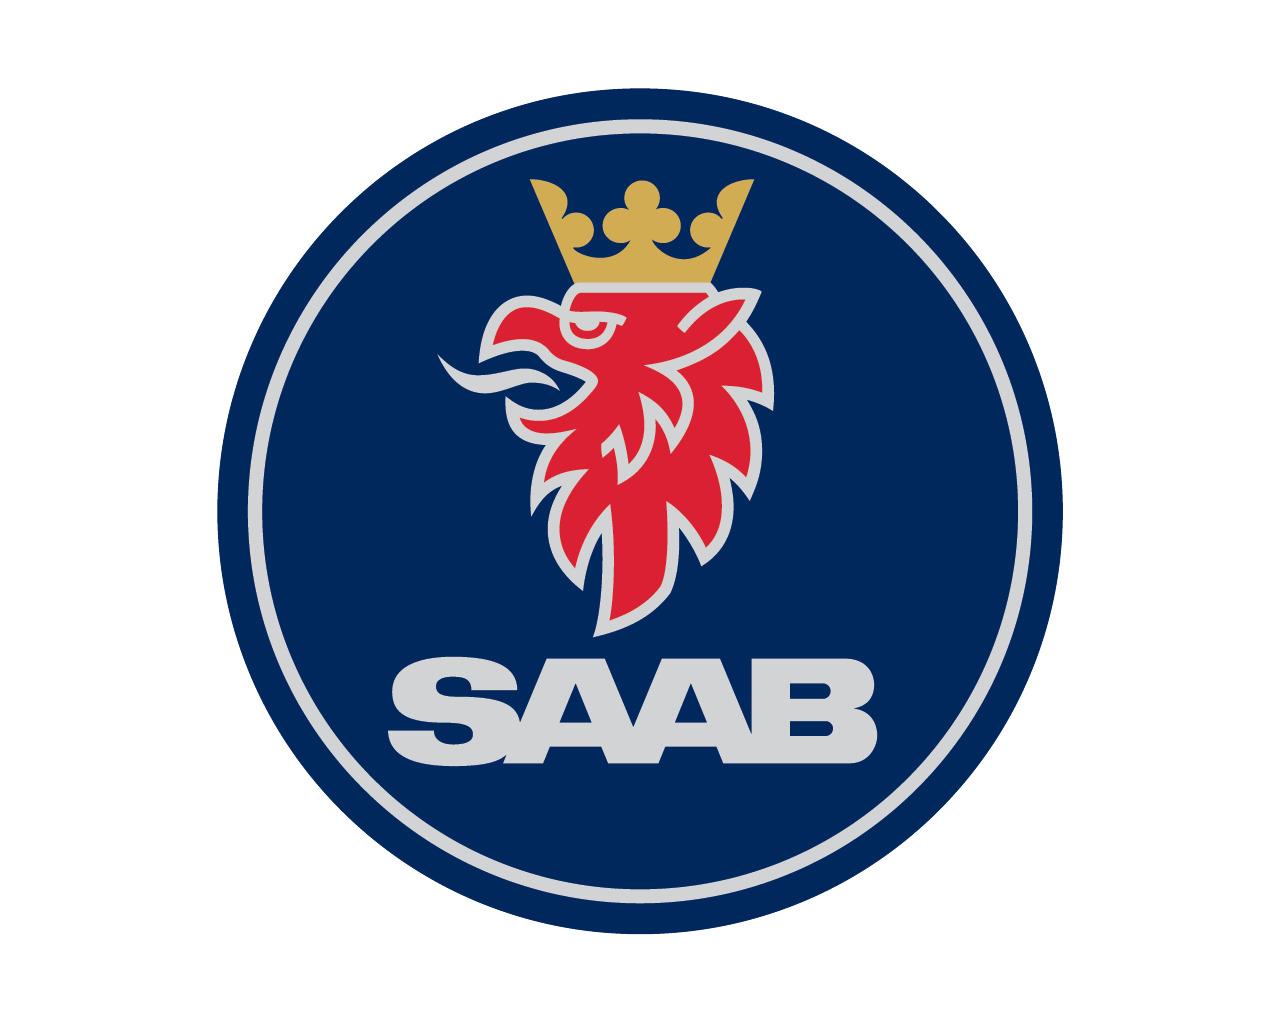 Imagen logo de Saab